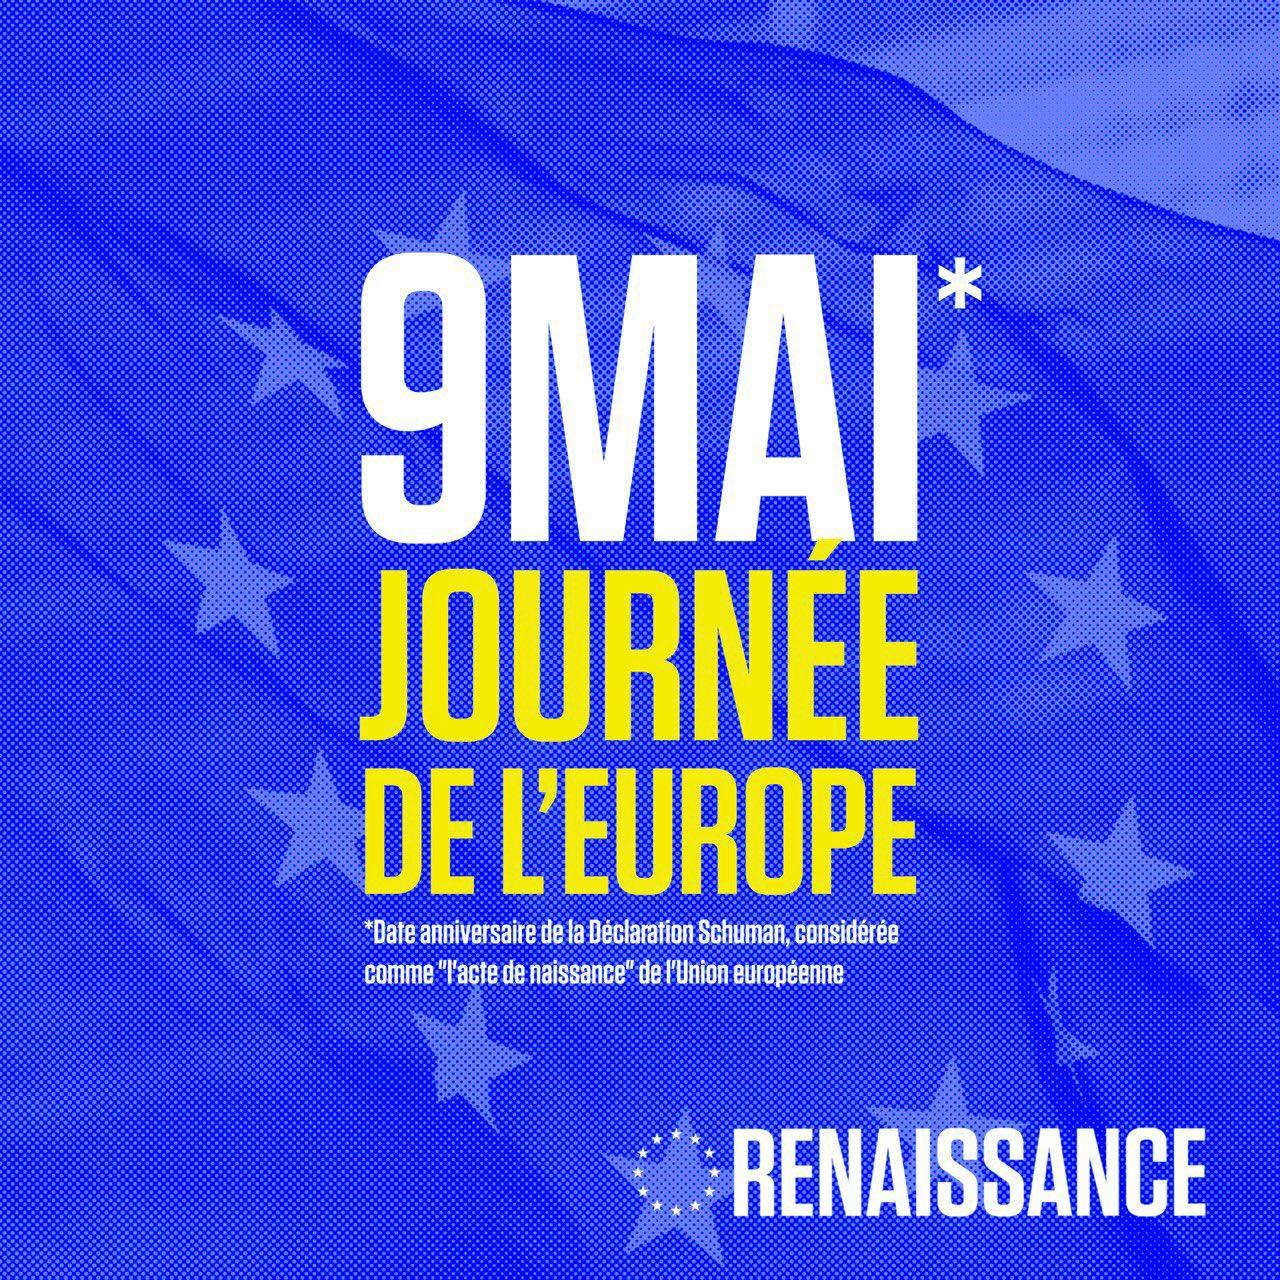 Journ%C3%A9e%20de%20l%27Europe%20-%209%20mai.JPG